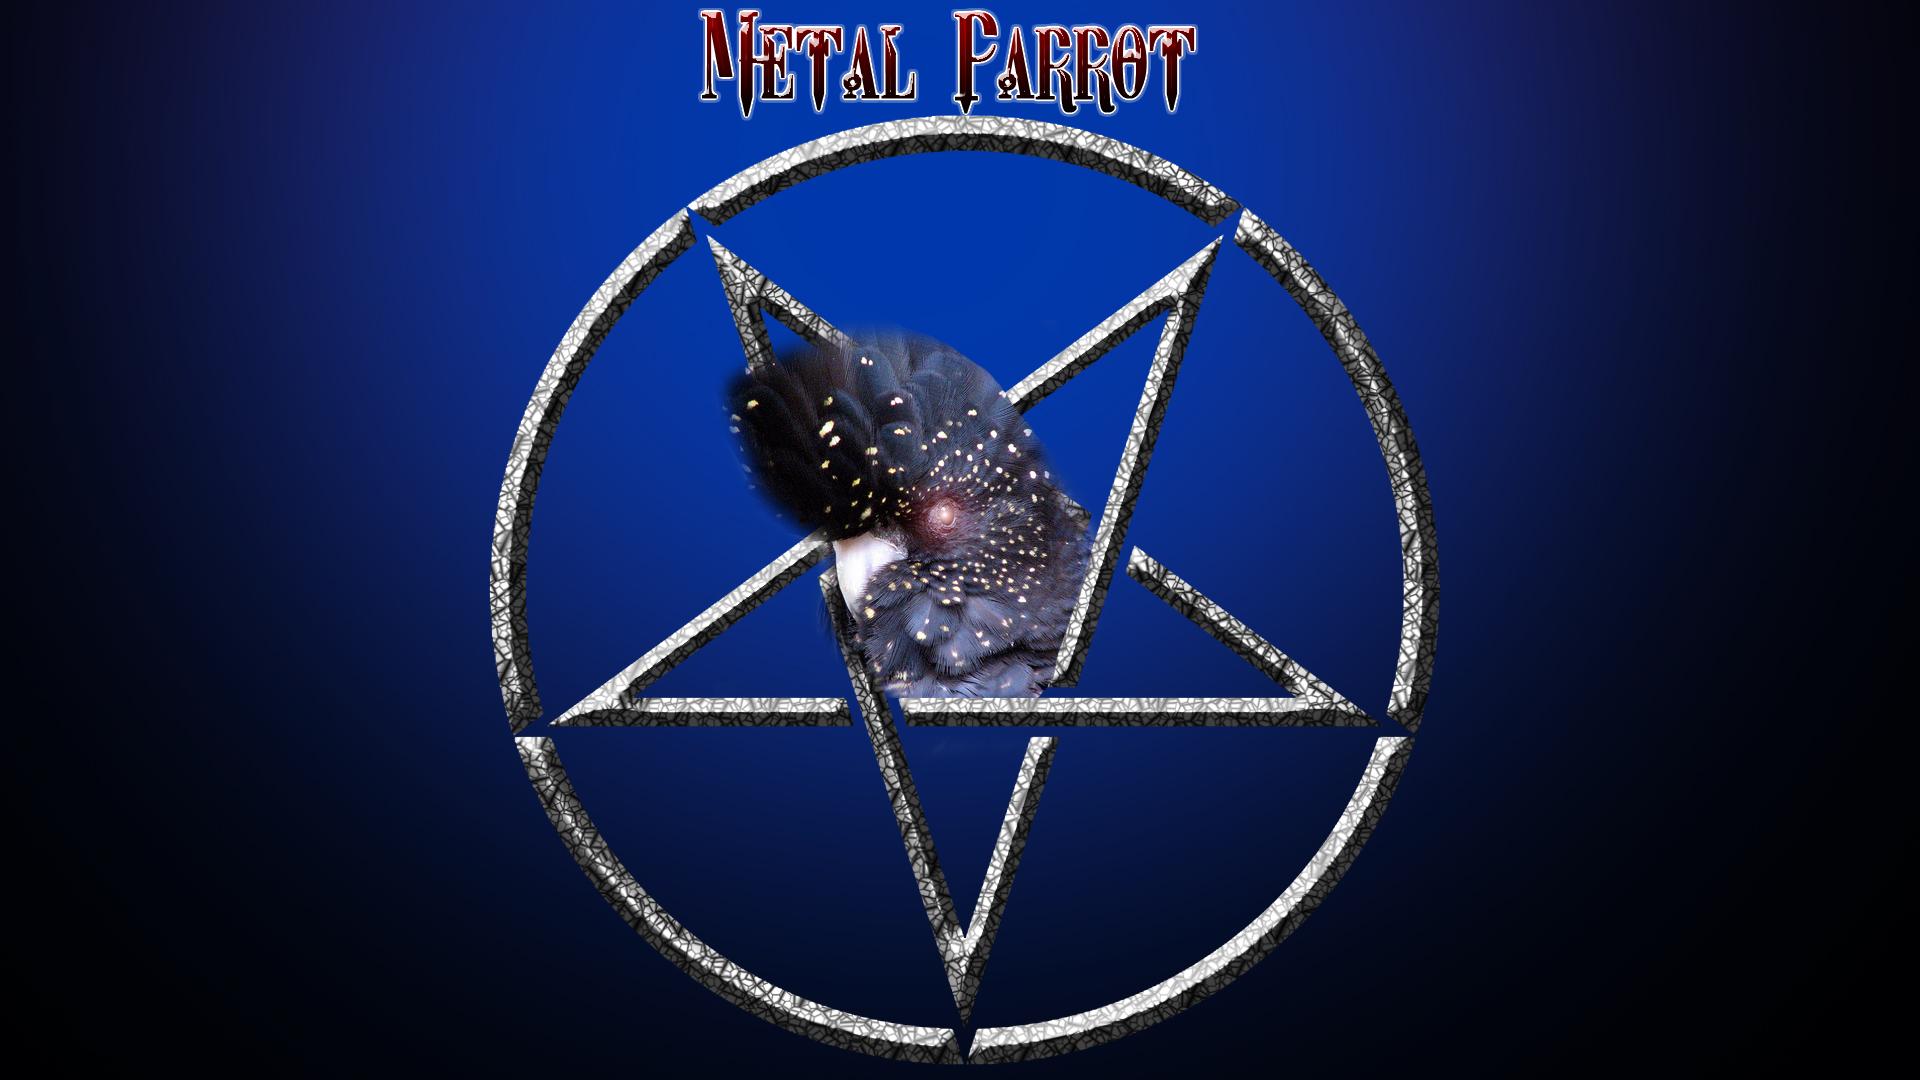 The Metal Parrot blue!